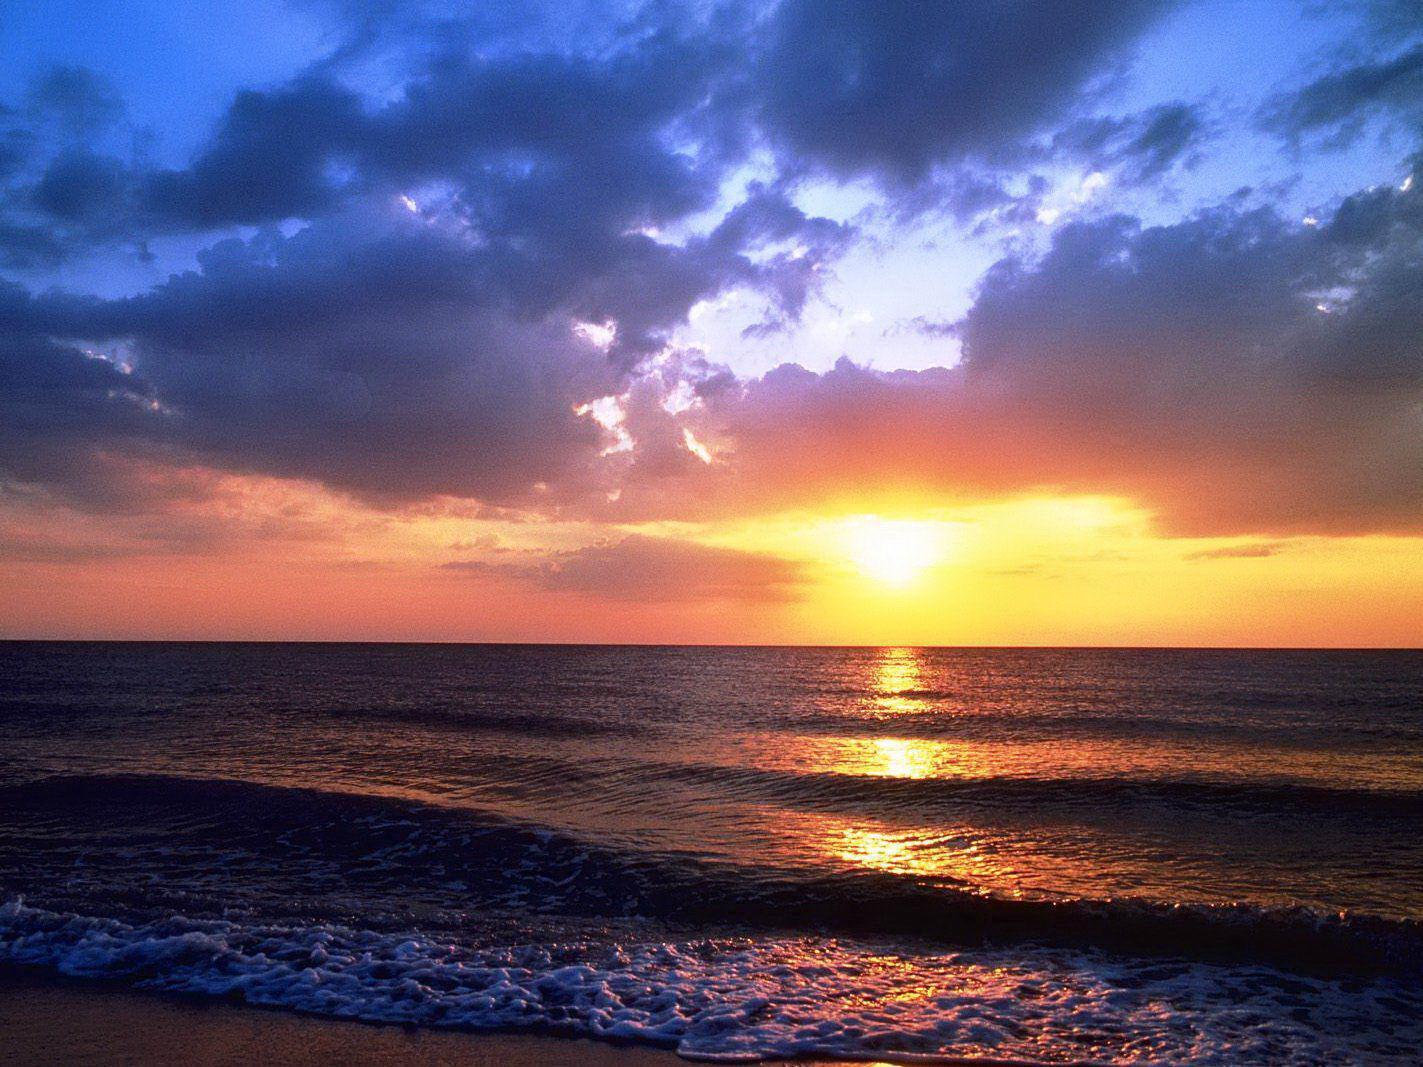 Sunset Desktop Backgrounds 1423x1067